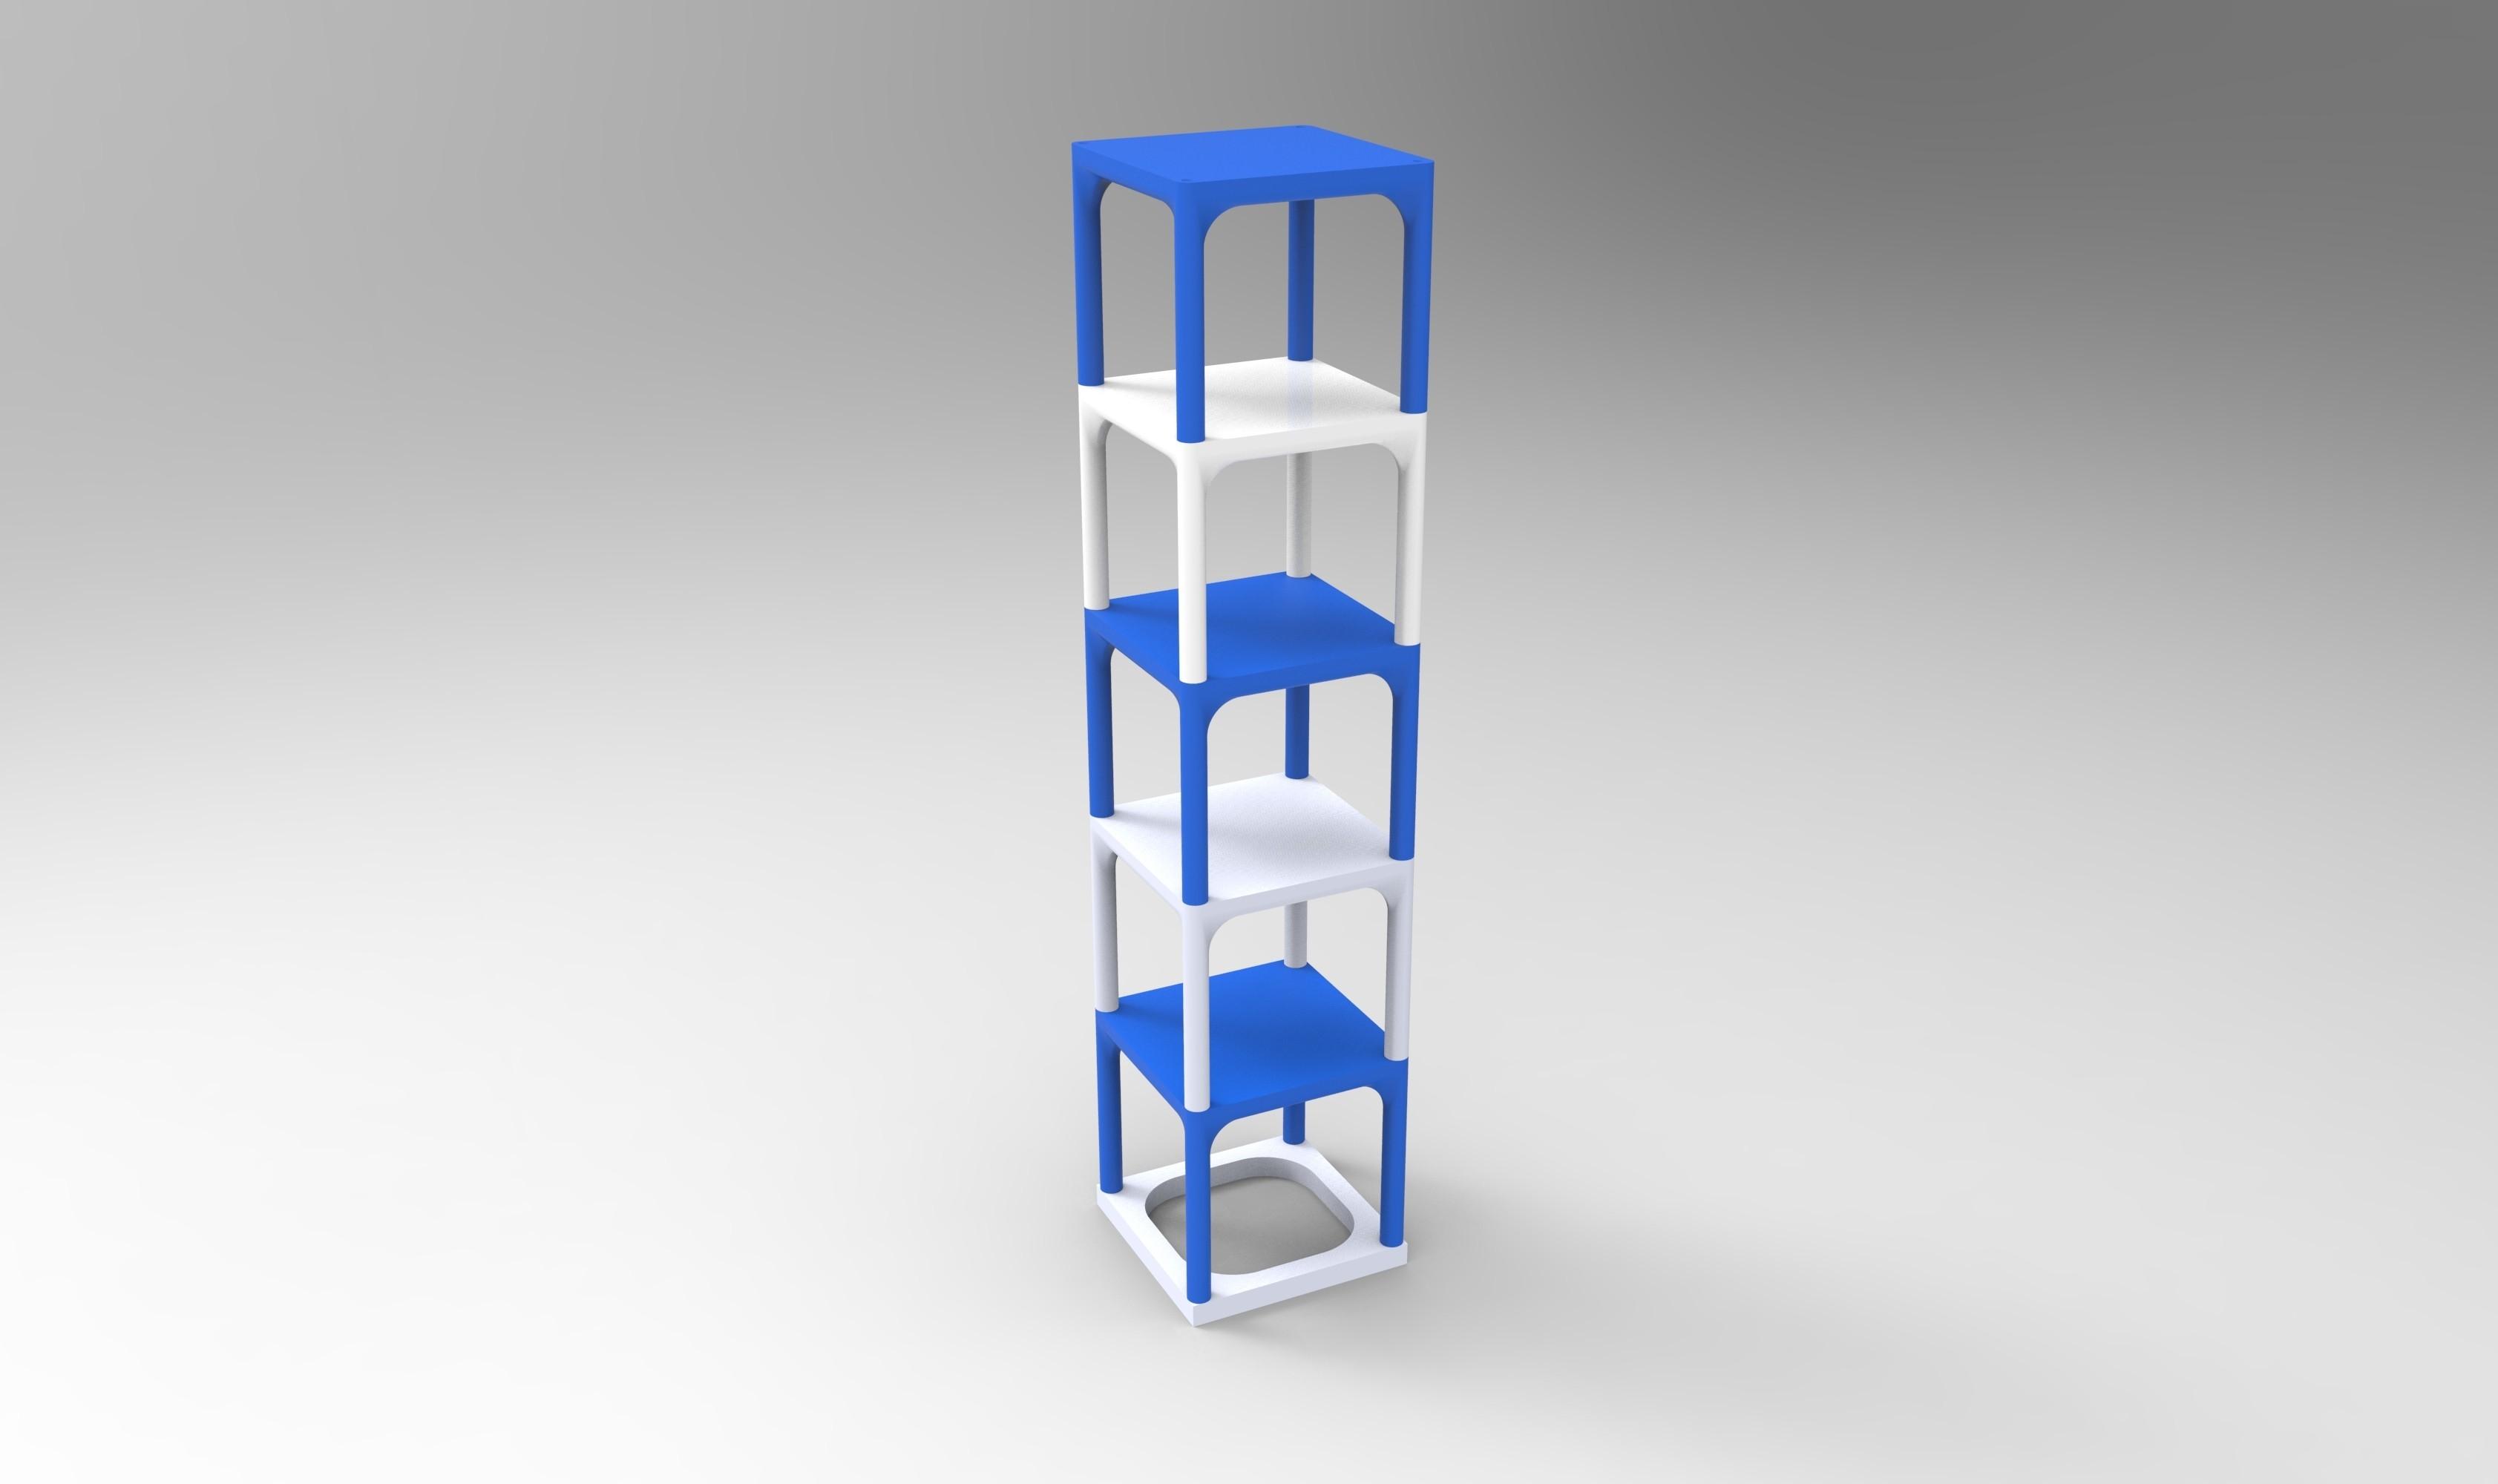 rendu enssemble  bleu blanc.jpg Download STL file Small table that can be transformed into a custom-made shelf • 3D printable design, GuilhemPerroud